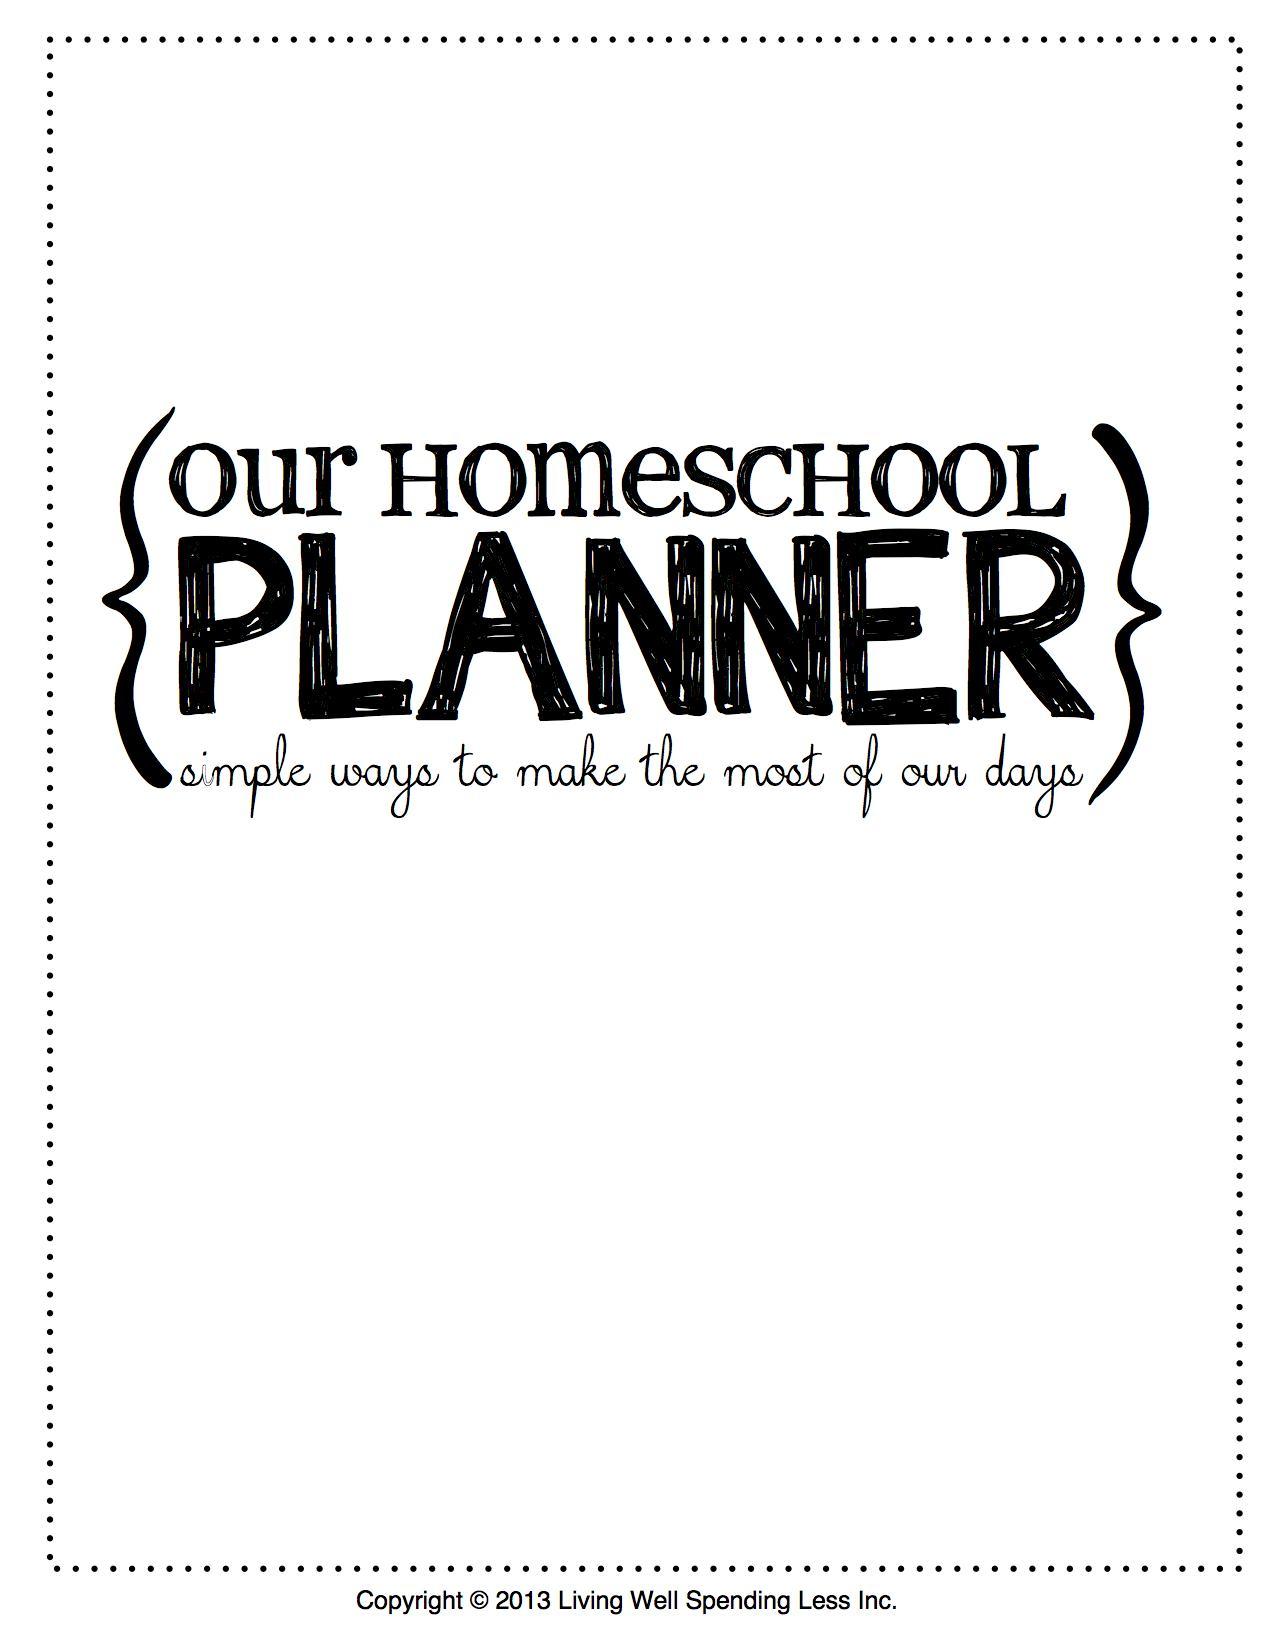 6 Images of Free Printable Homeschool Binder Cover